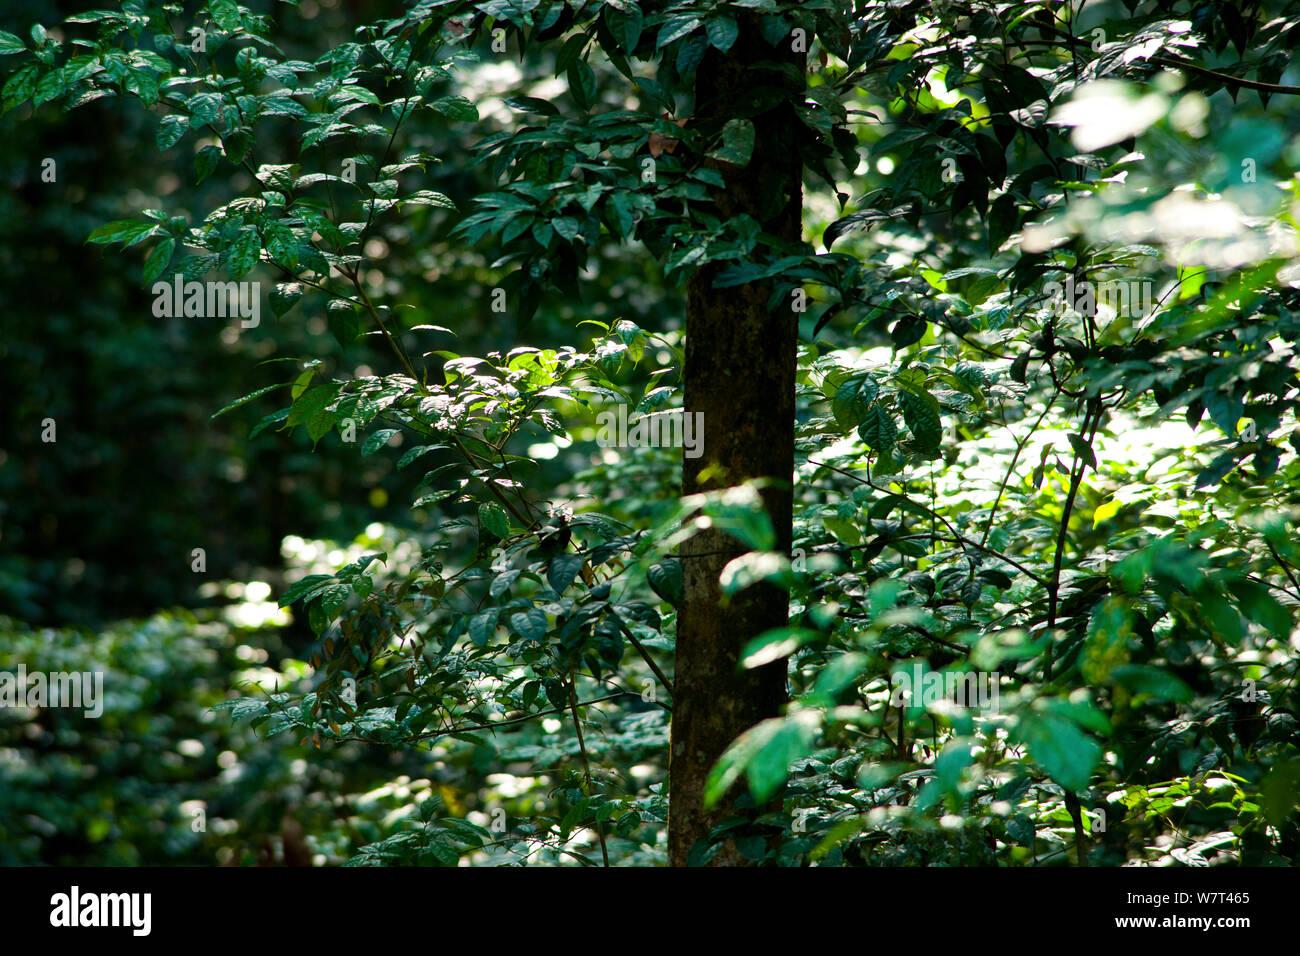 Babango (Diospyros bipindensis or Diospyros iturensis) tree. Food plant for many primates including Gorillas and Chimpanzees, Bai Hokou, Dzanga-Ndoki National Park, Central African Republic. Stock Photo